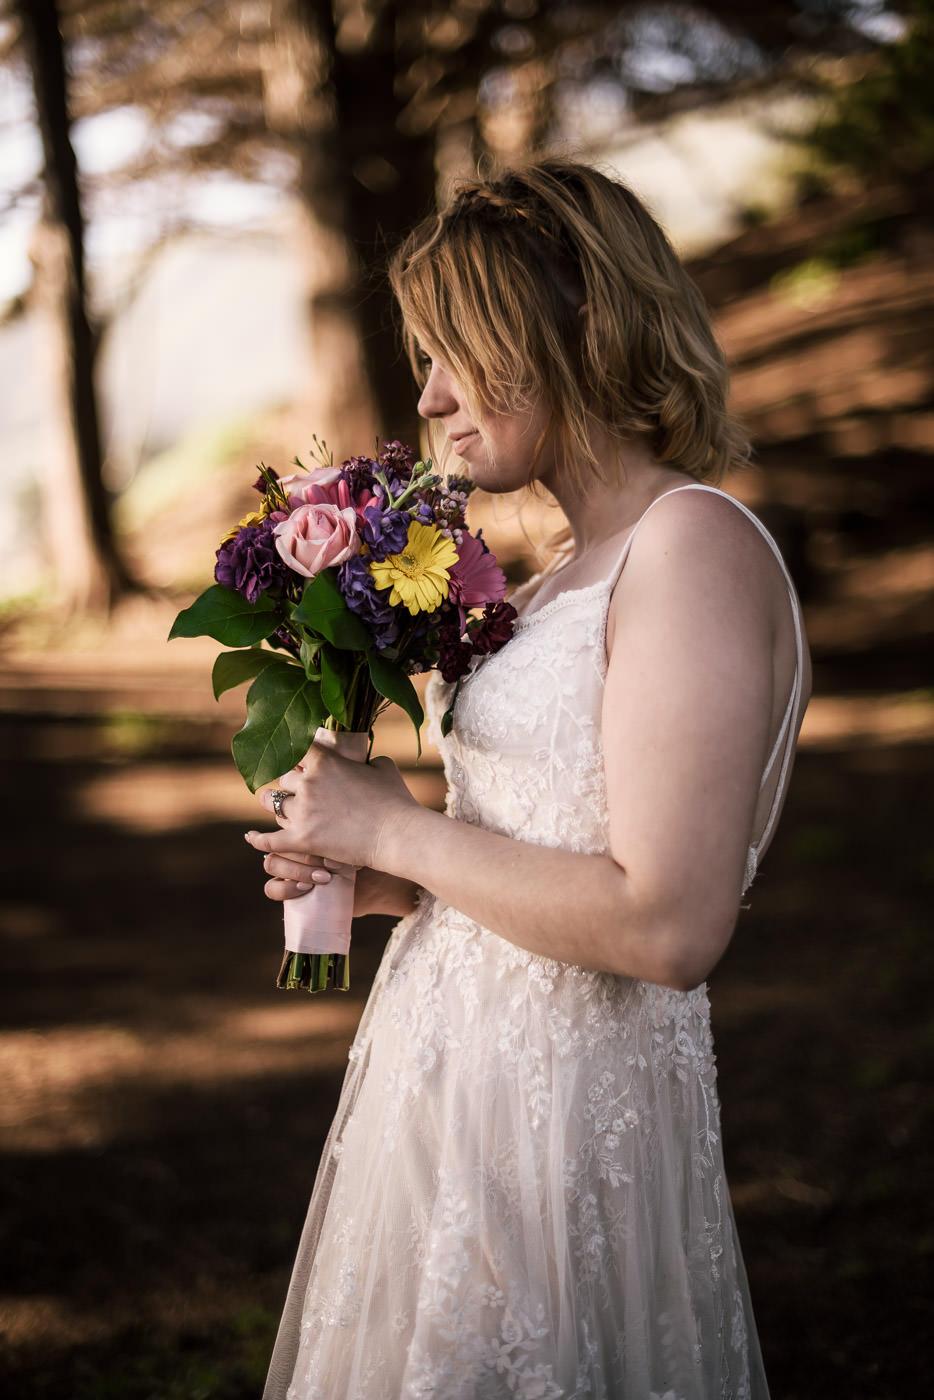 Stunning portrait of a bride at her elopement in Big Sur.